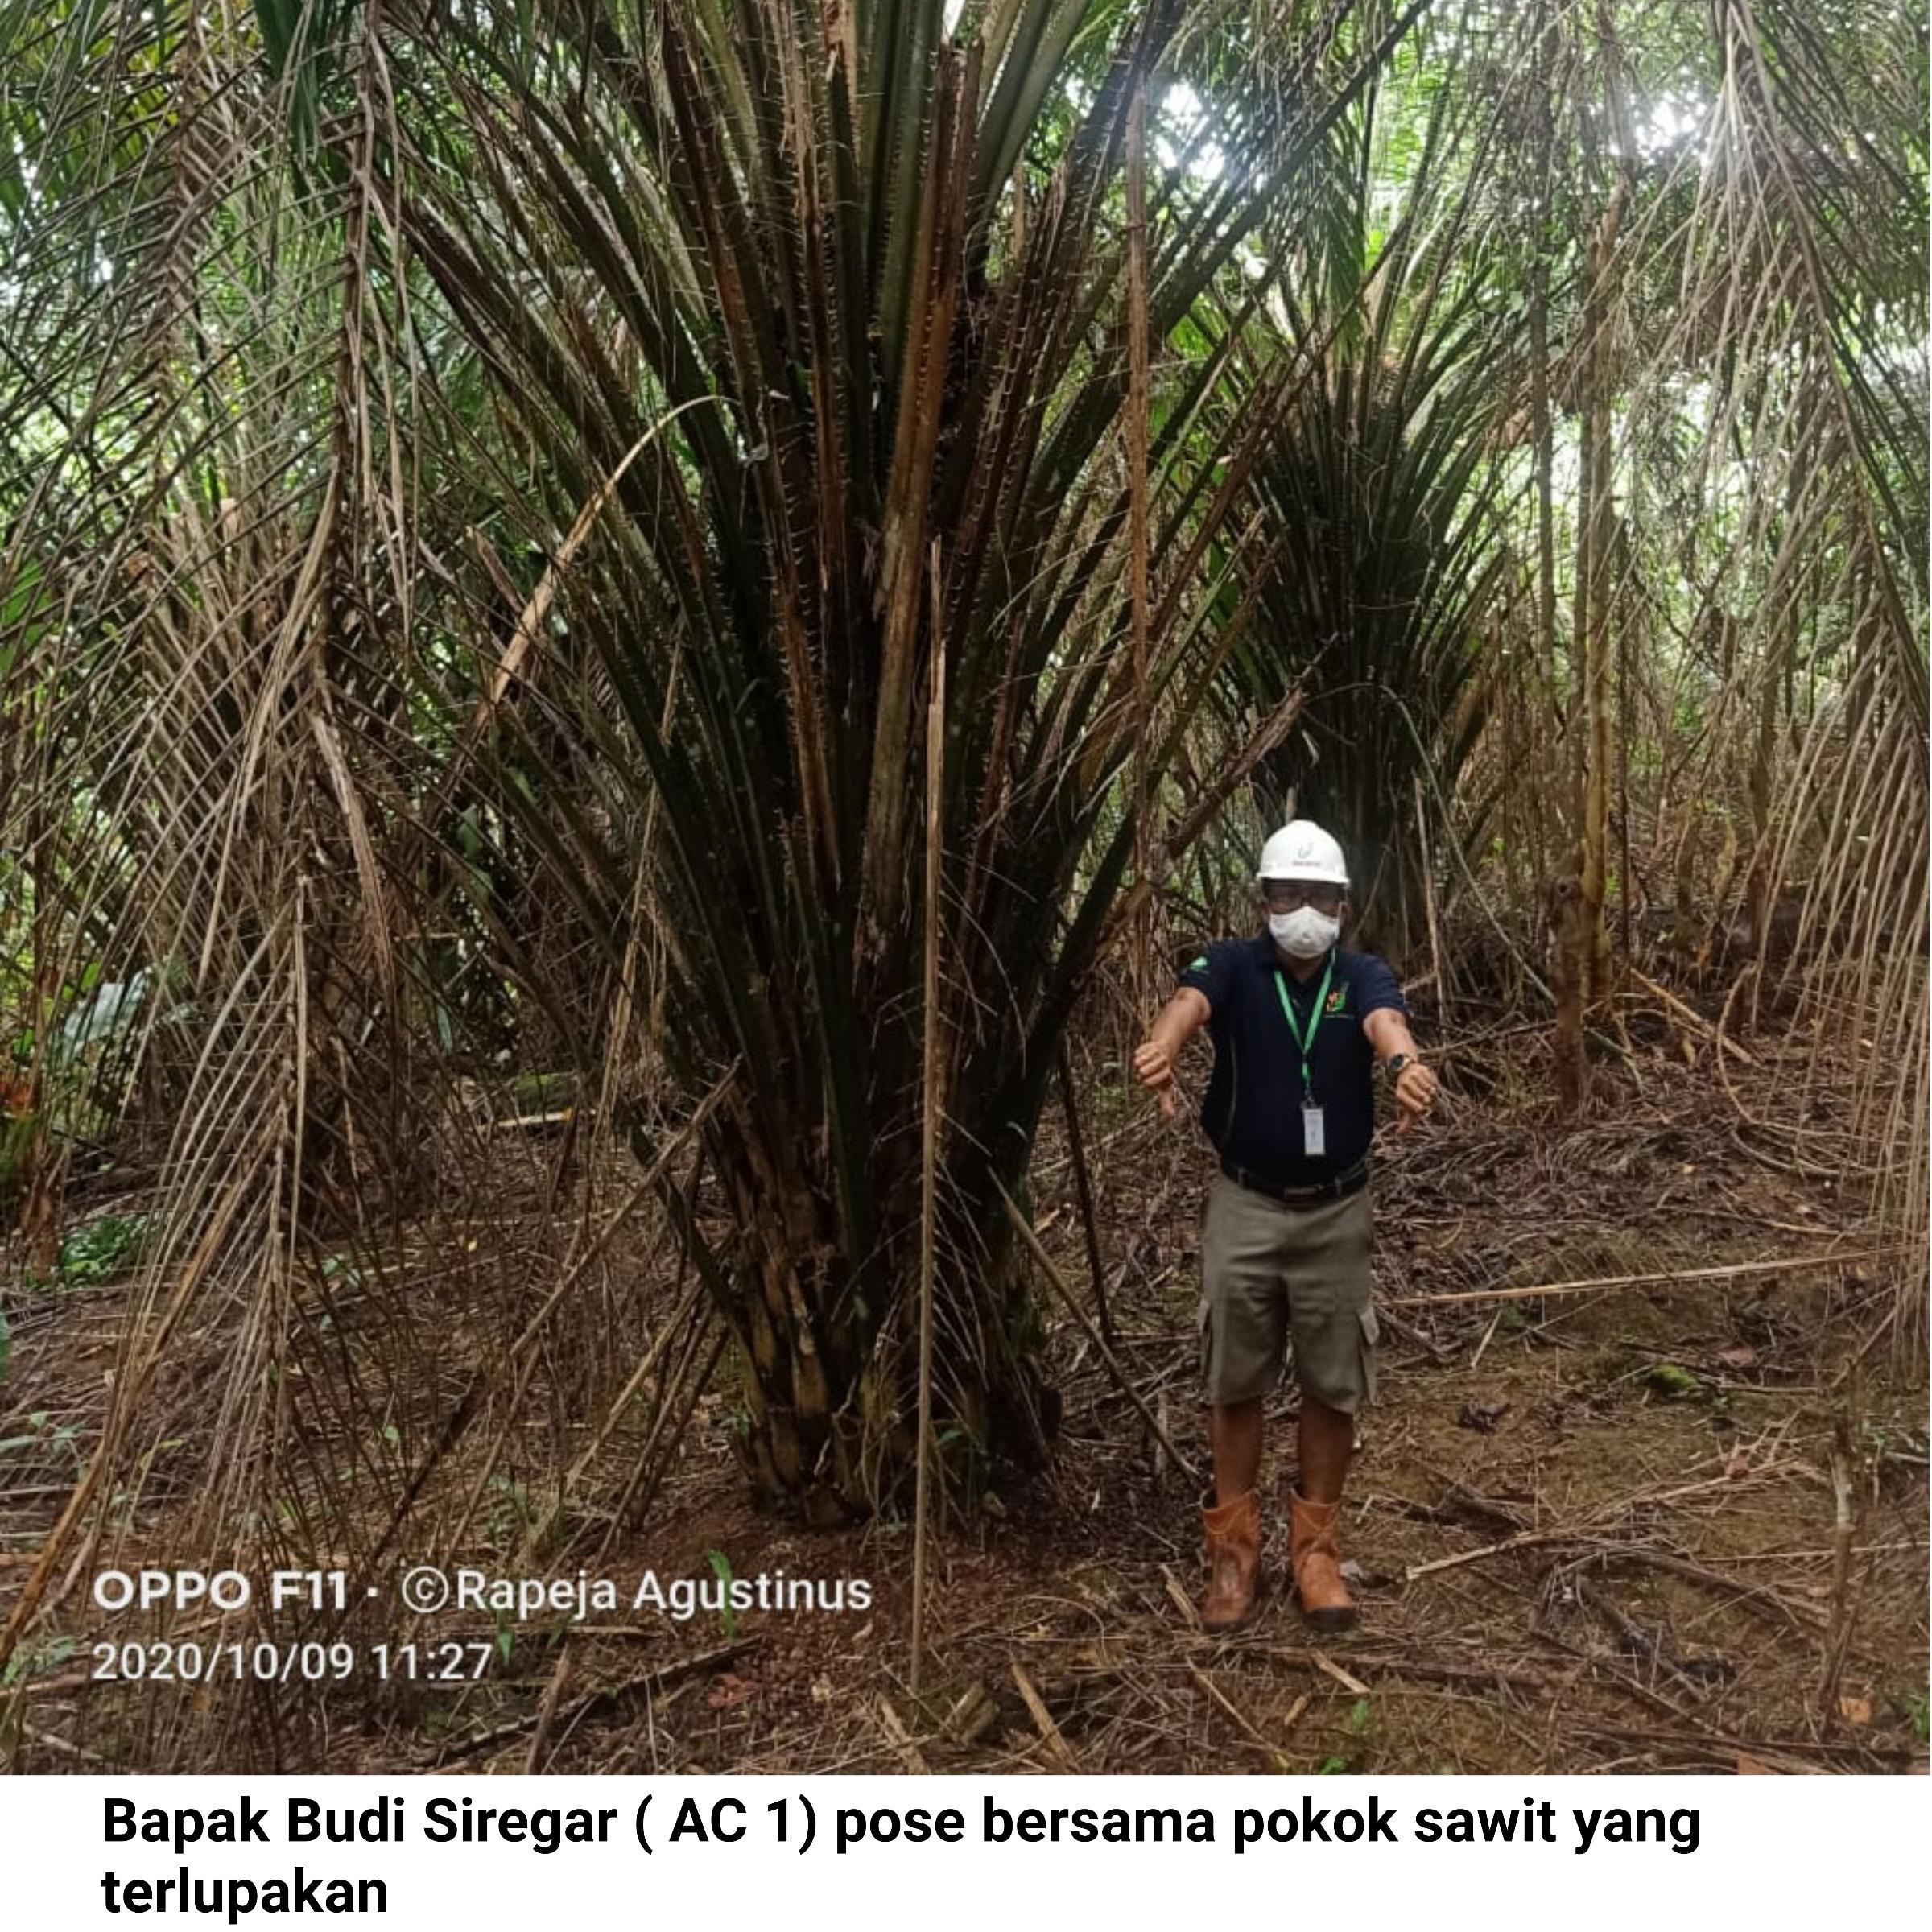 Area Controller 1 Berpose di Pokok Kelapa Sawit yang terlupakan